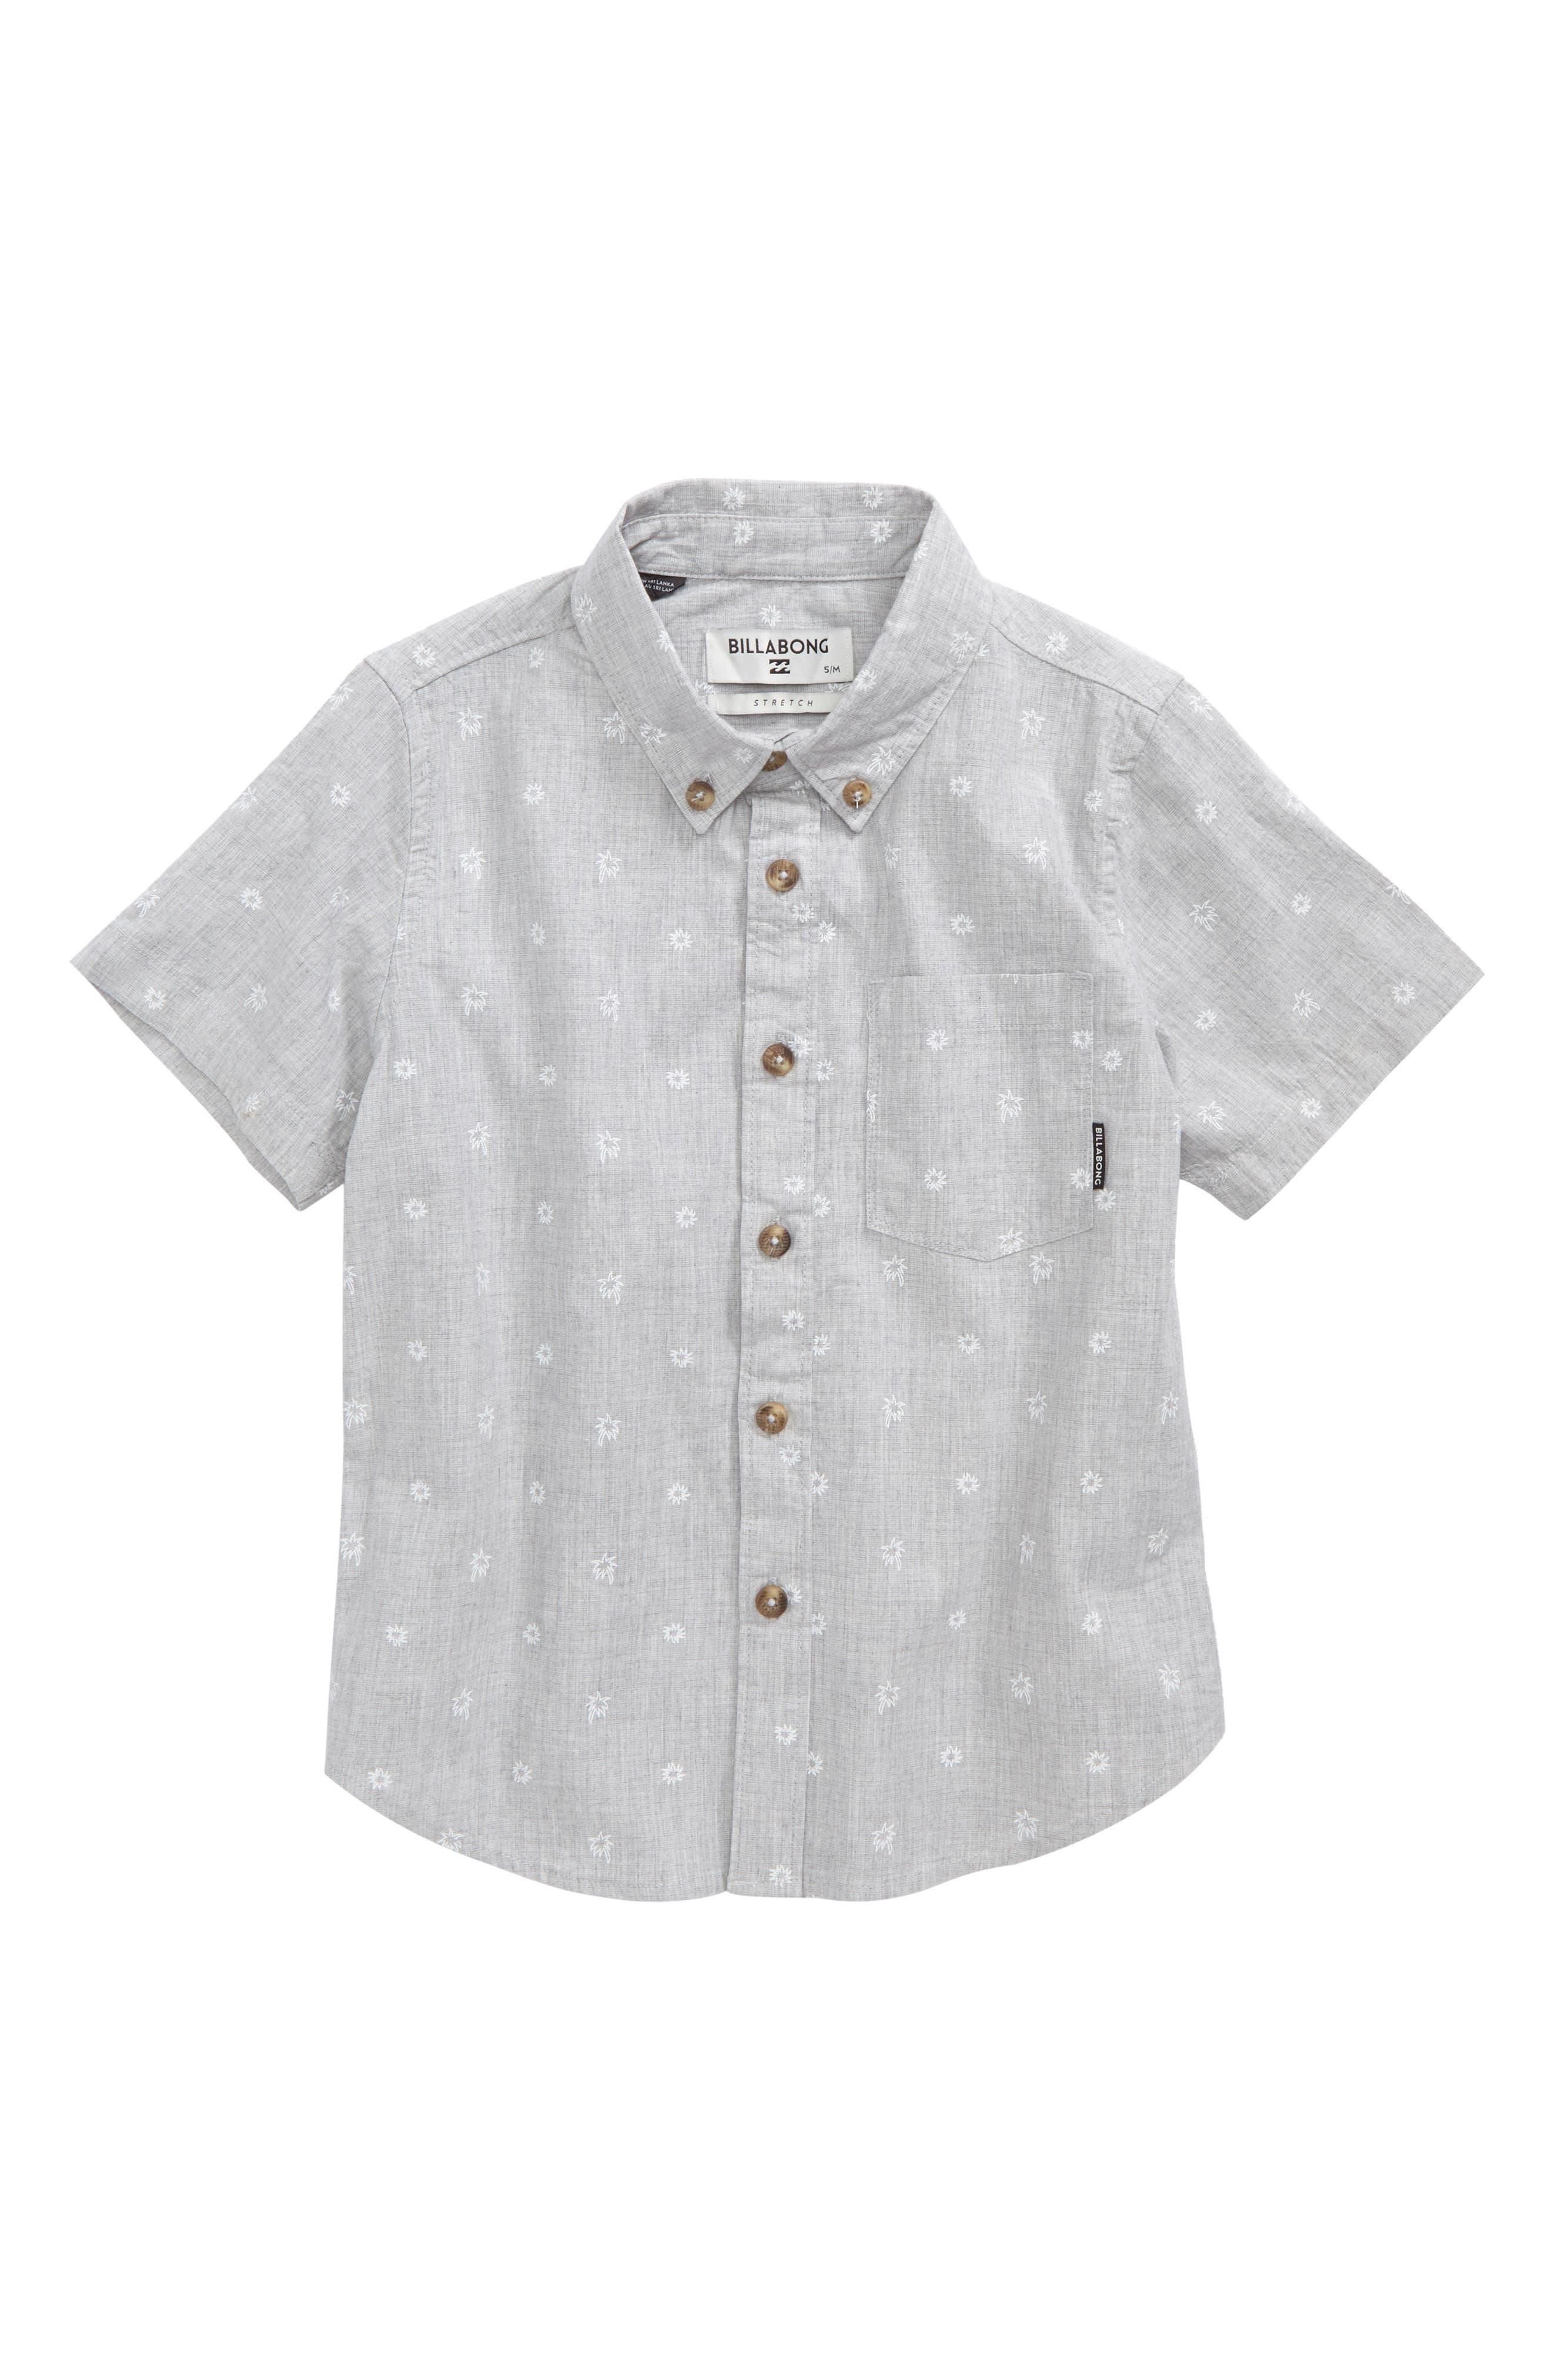 Main Image - Billabong Sundays Mini Woven Shirt (Toddler Boys & Little Boys)